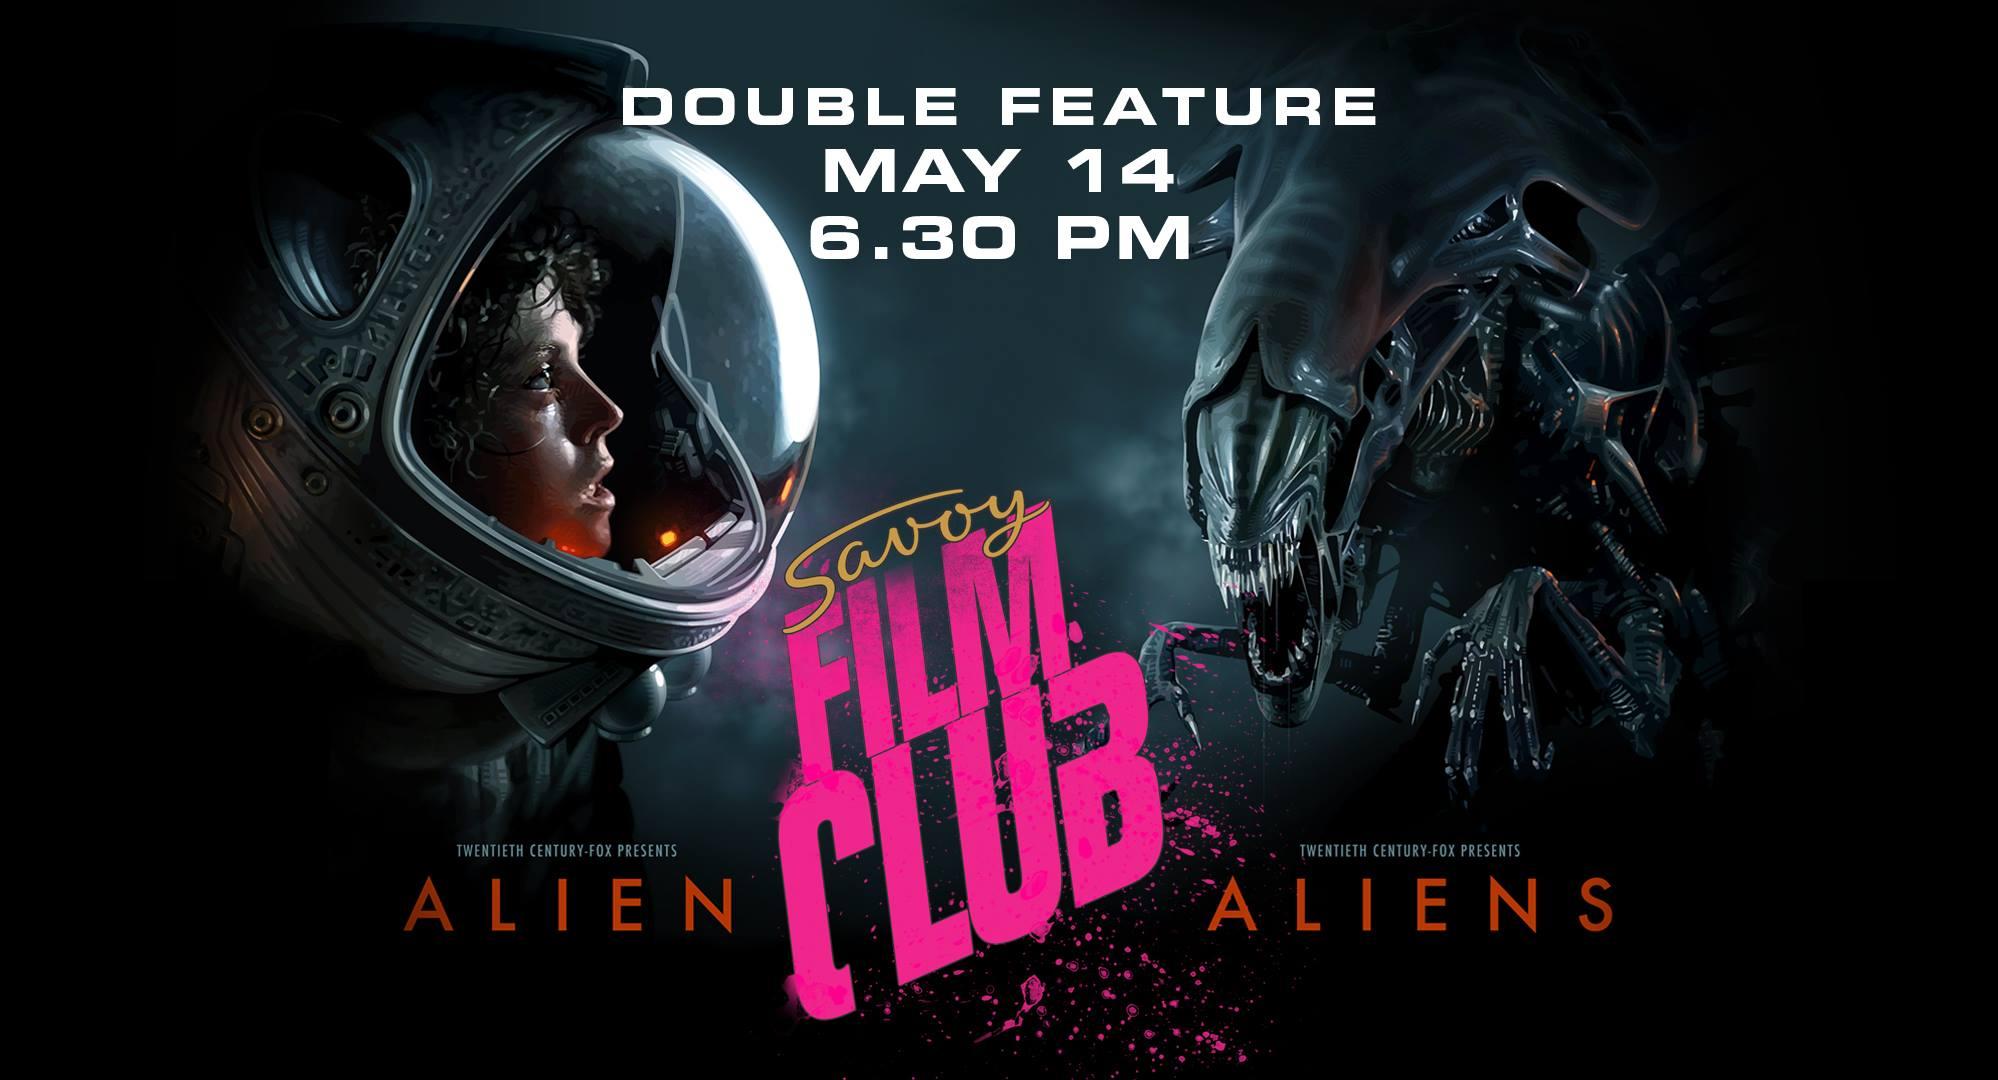 Der Film ALIEN-Double (OV) lässt dich erschaudern.